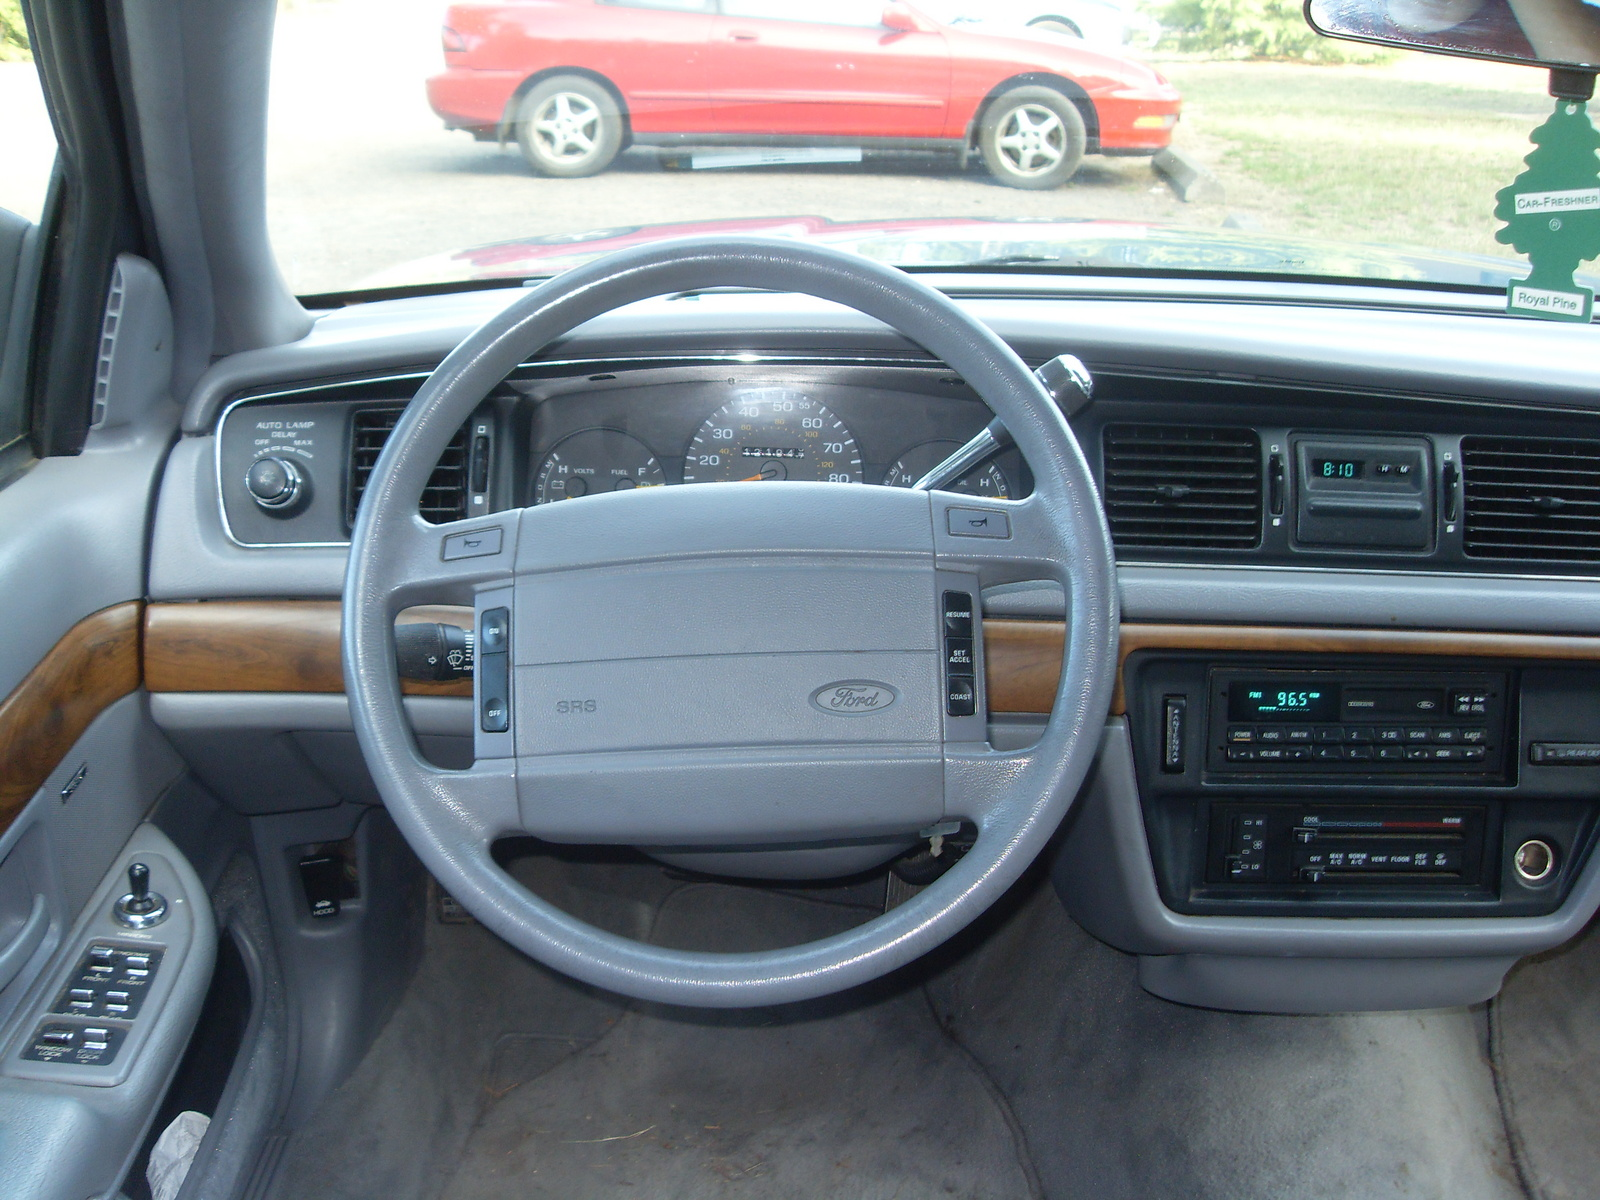 Ford Crown Victoria II 1997 - 2011 Sedan #3